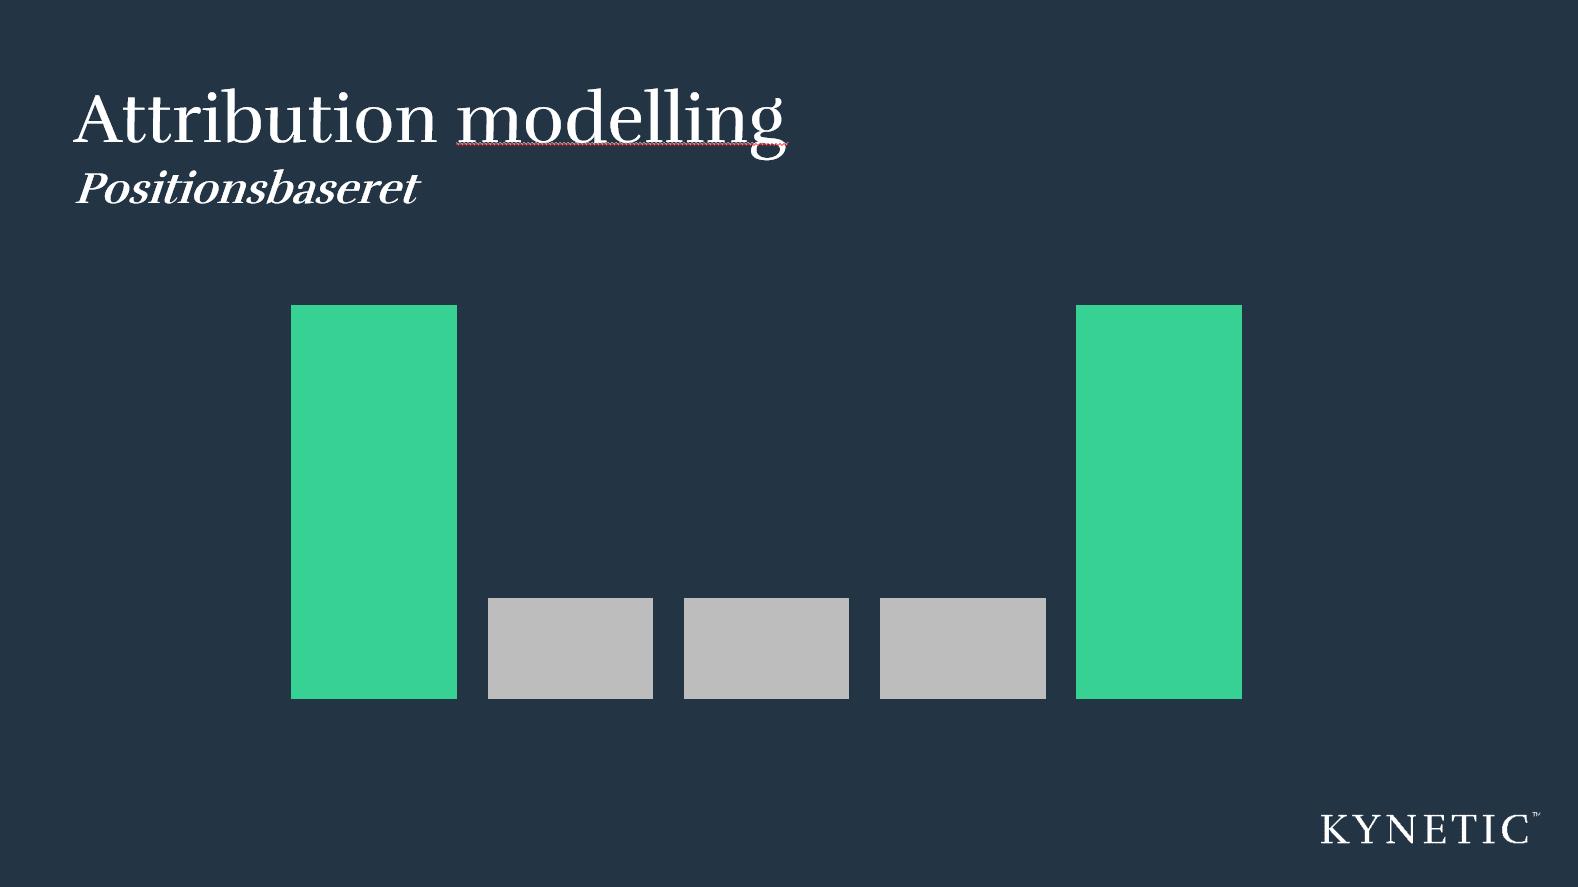 Positionsbaseret attribution modelling